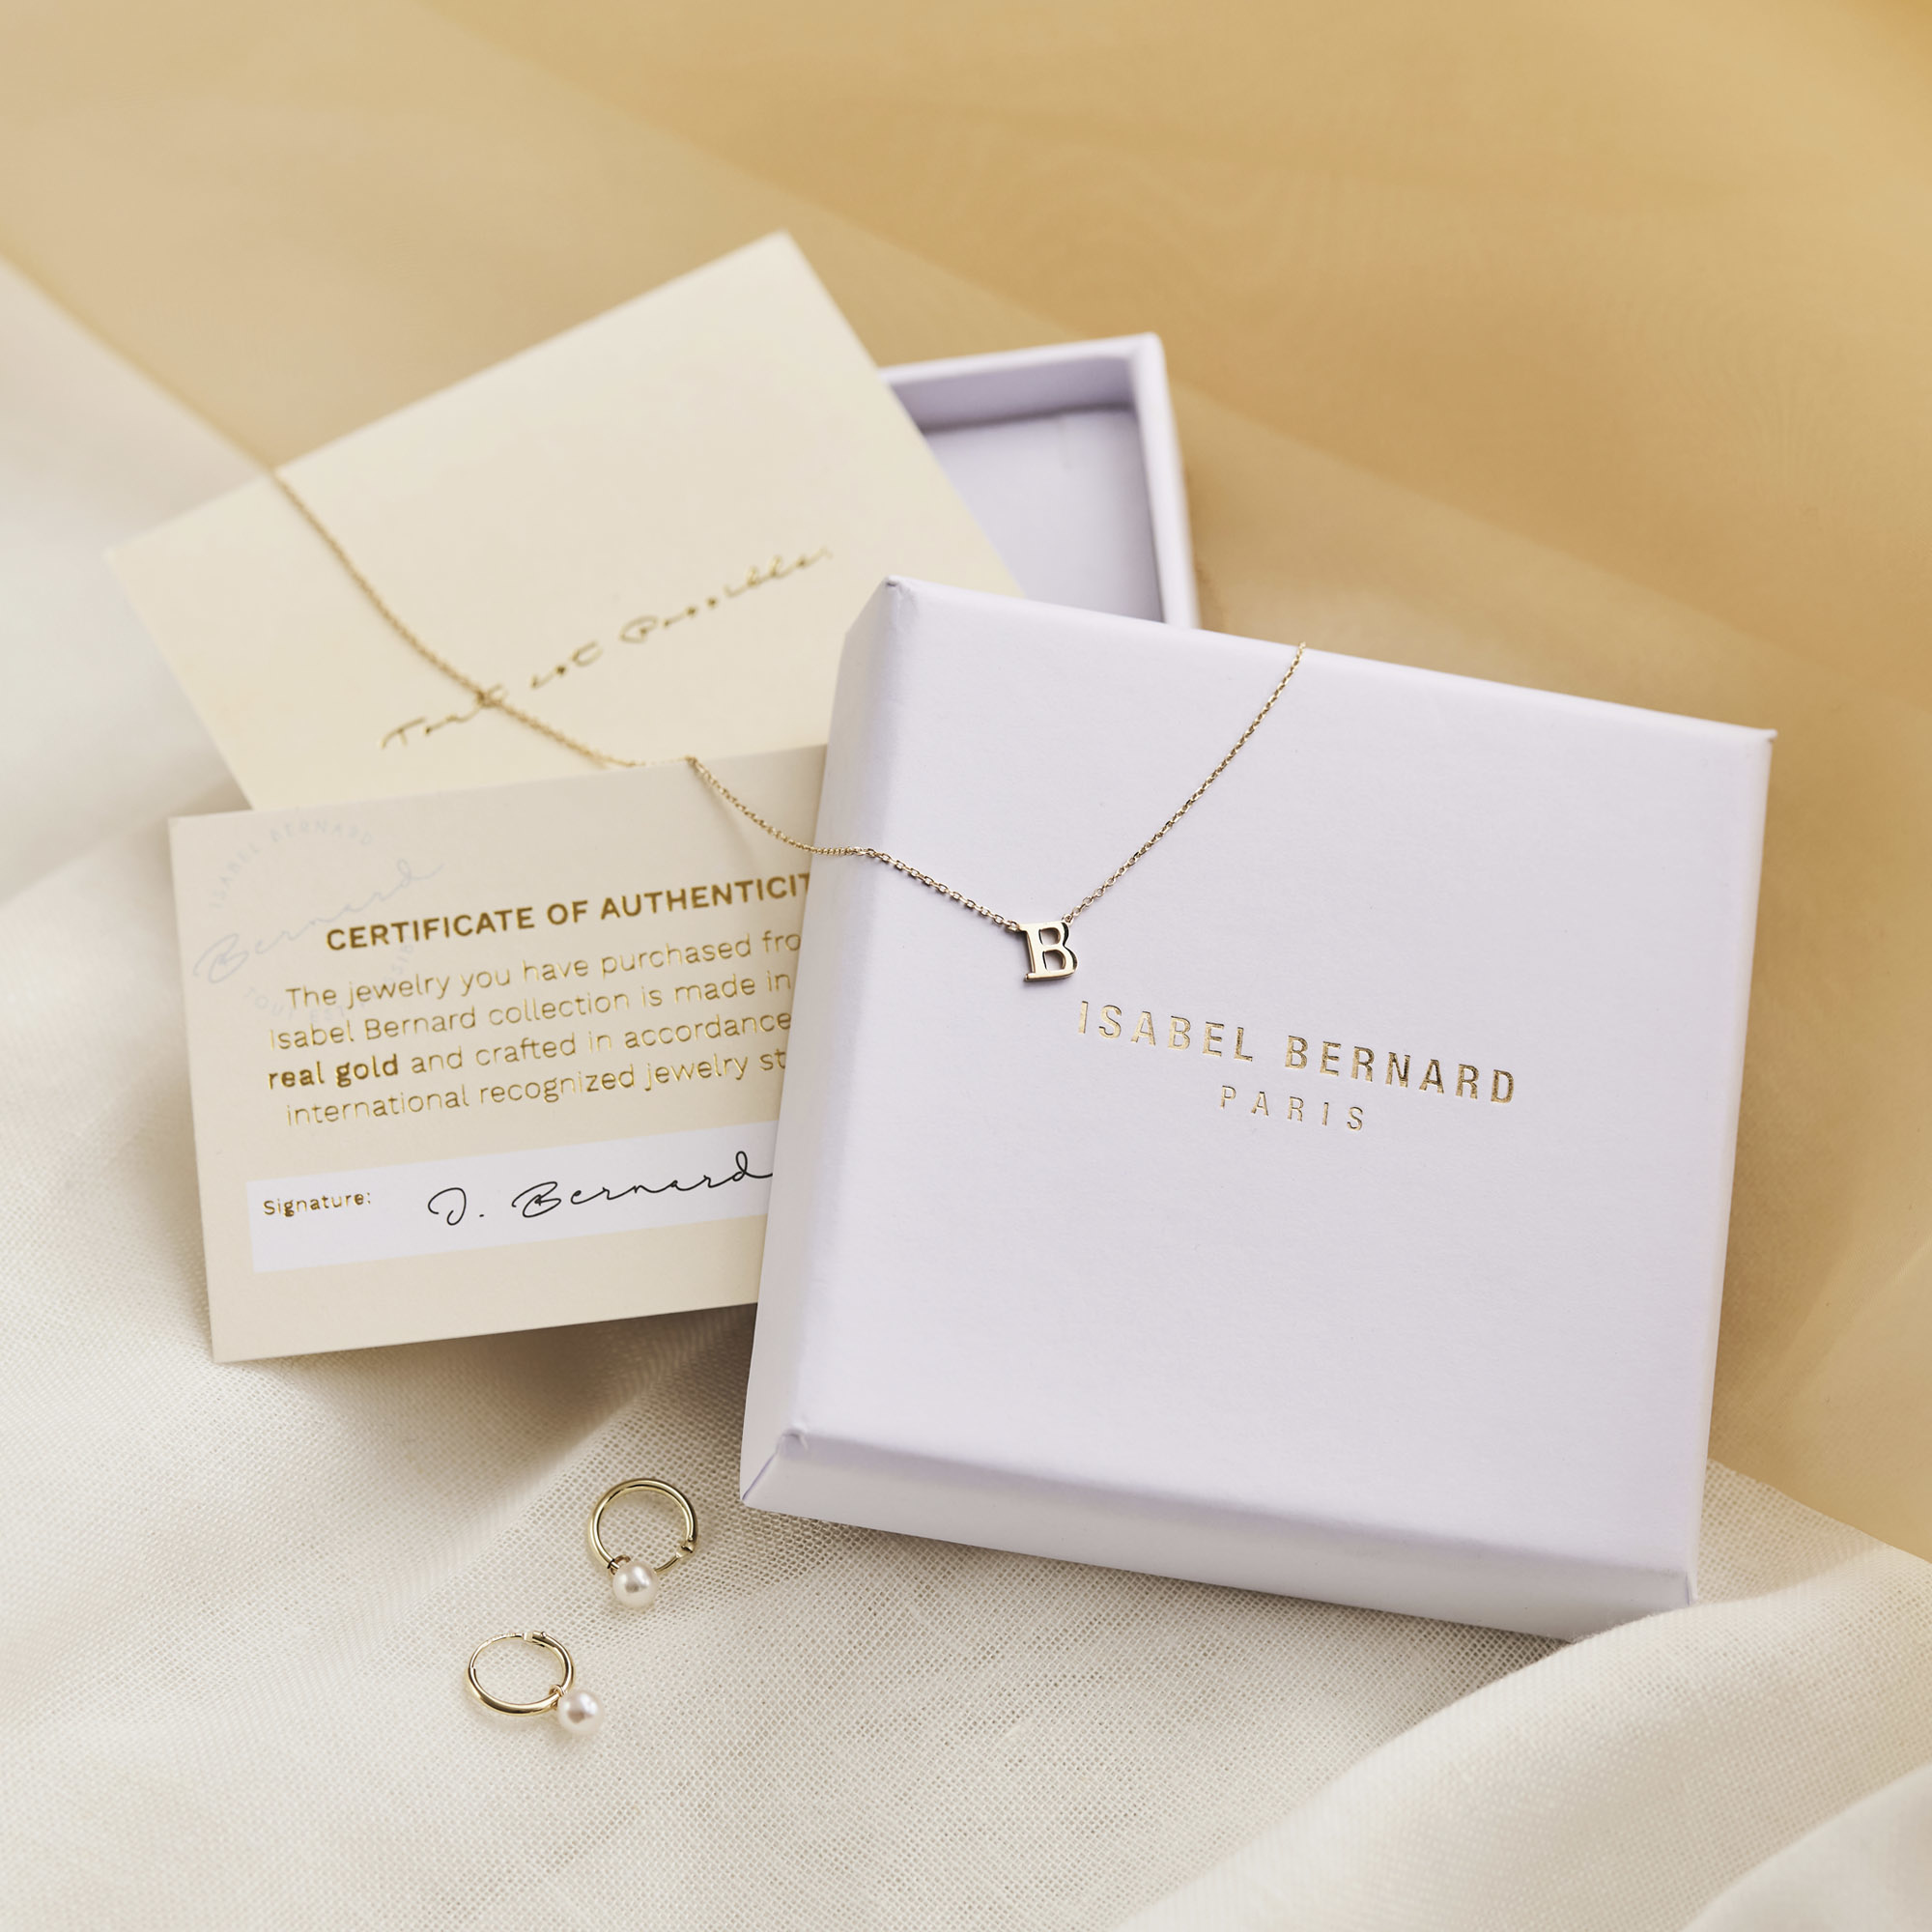 Isabel Bernard Saint Germain Chloé 14 karat white gold initial collier with letter